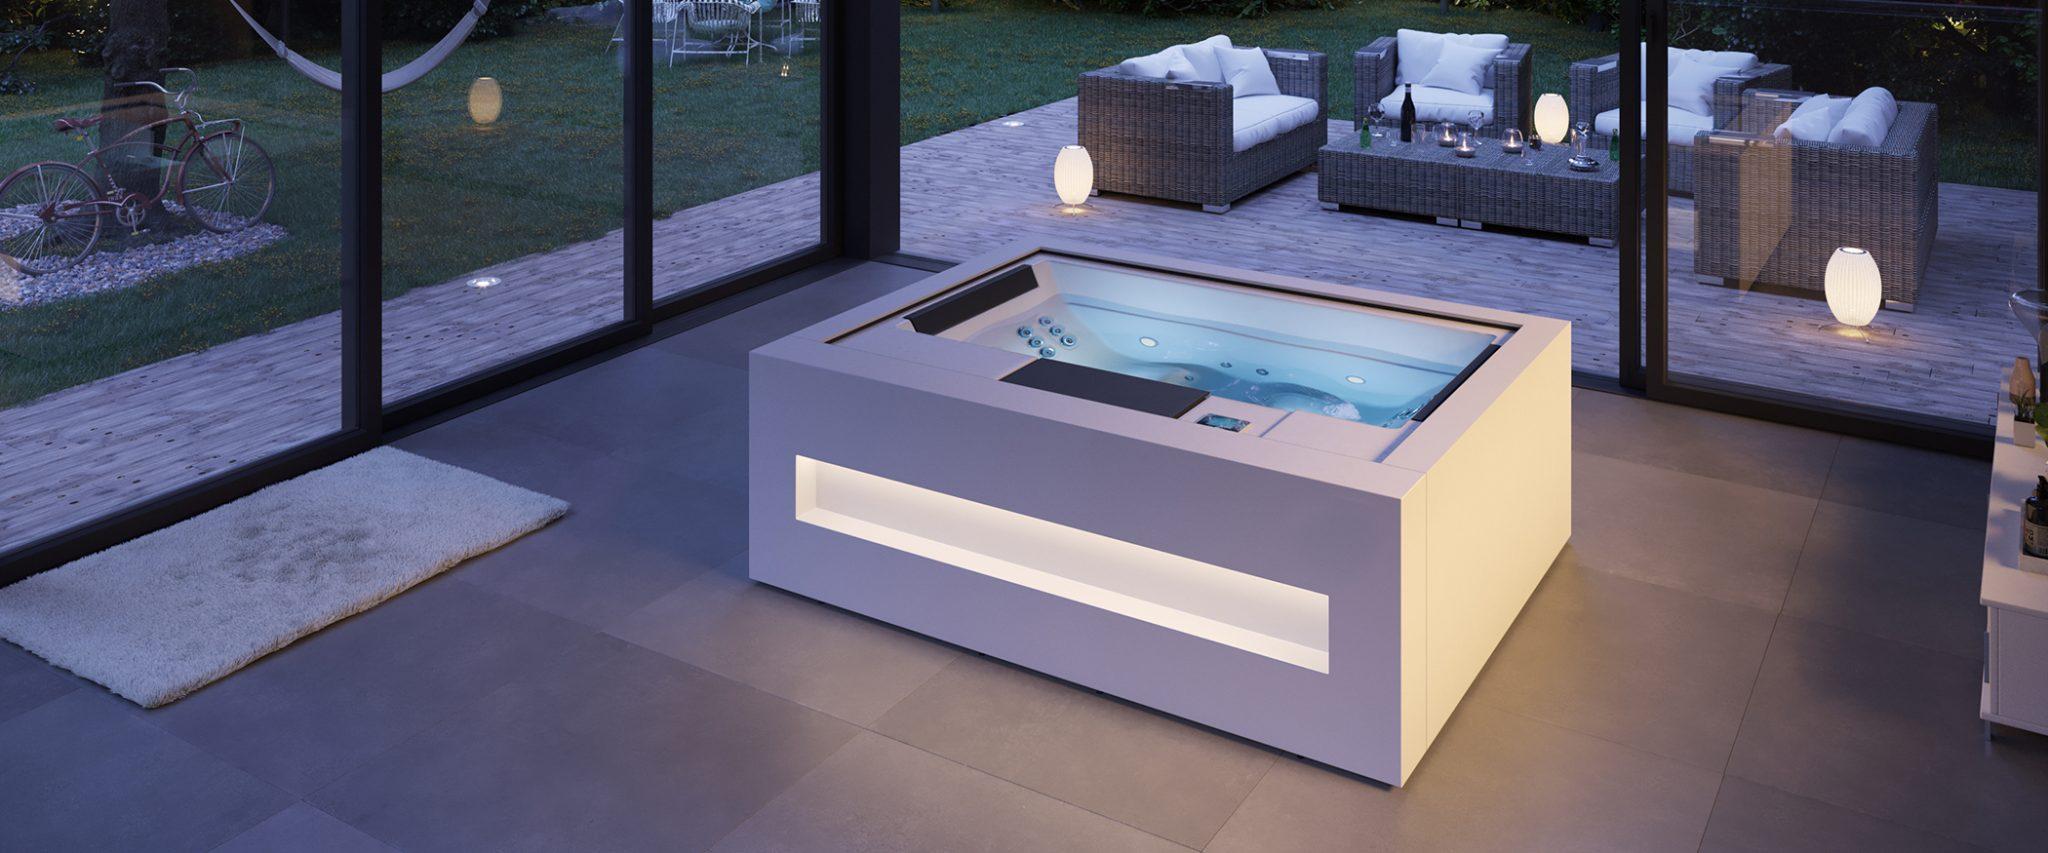 home-spa-aquavia-spa-002 Наружные SPA ванны